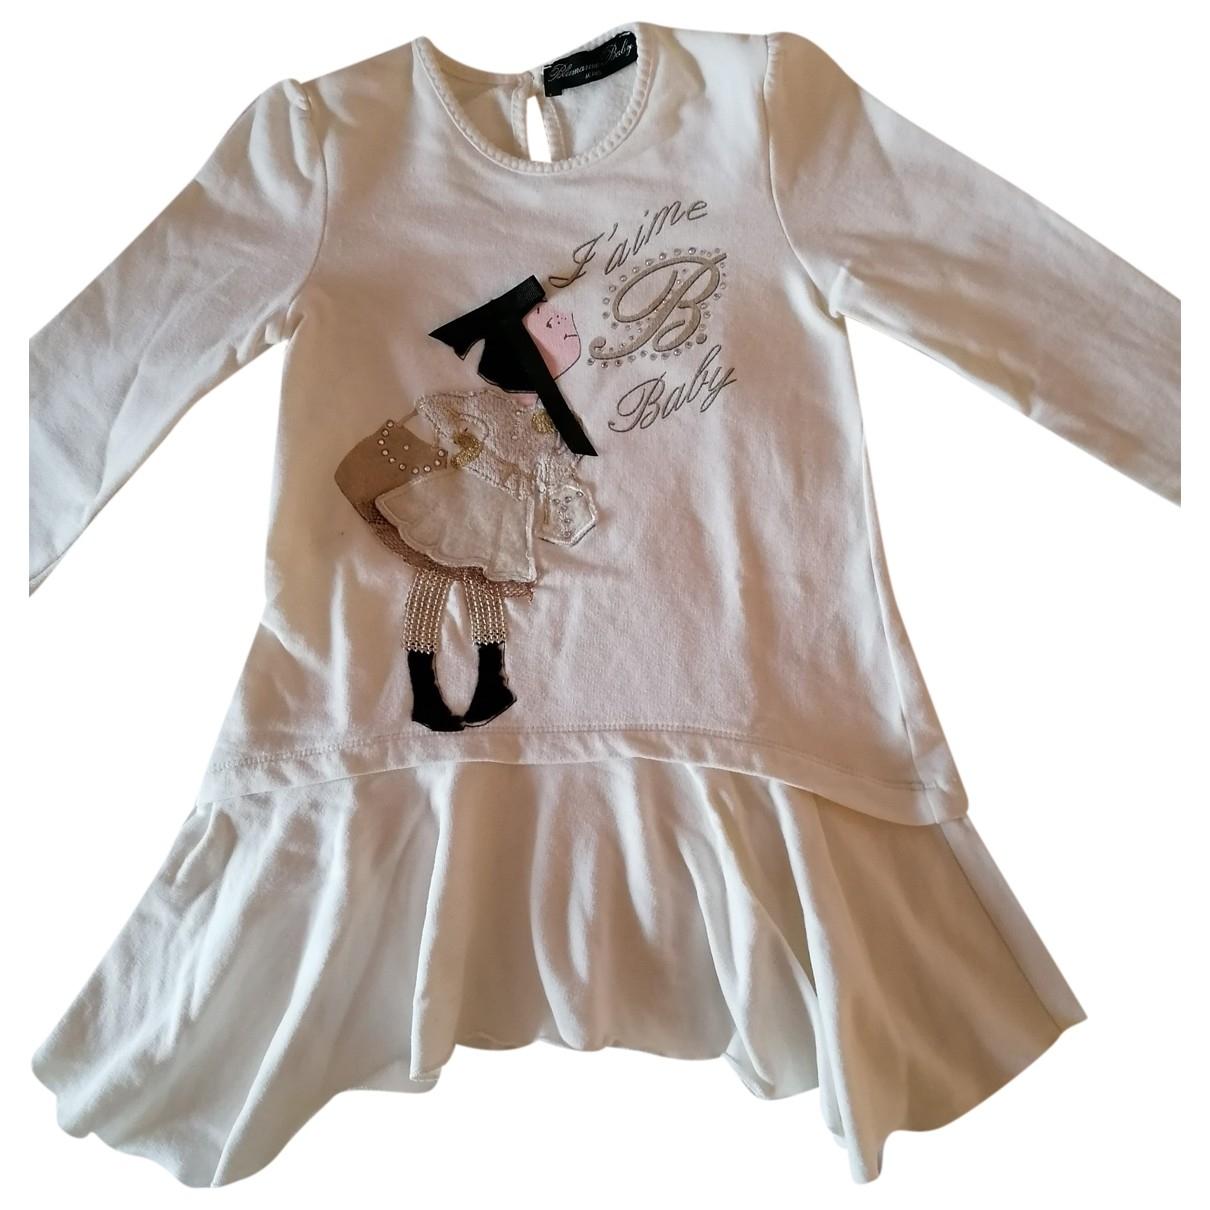 Blumarine \N Beige Cotton dress for Kids 2 years - up to 86cm FR